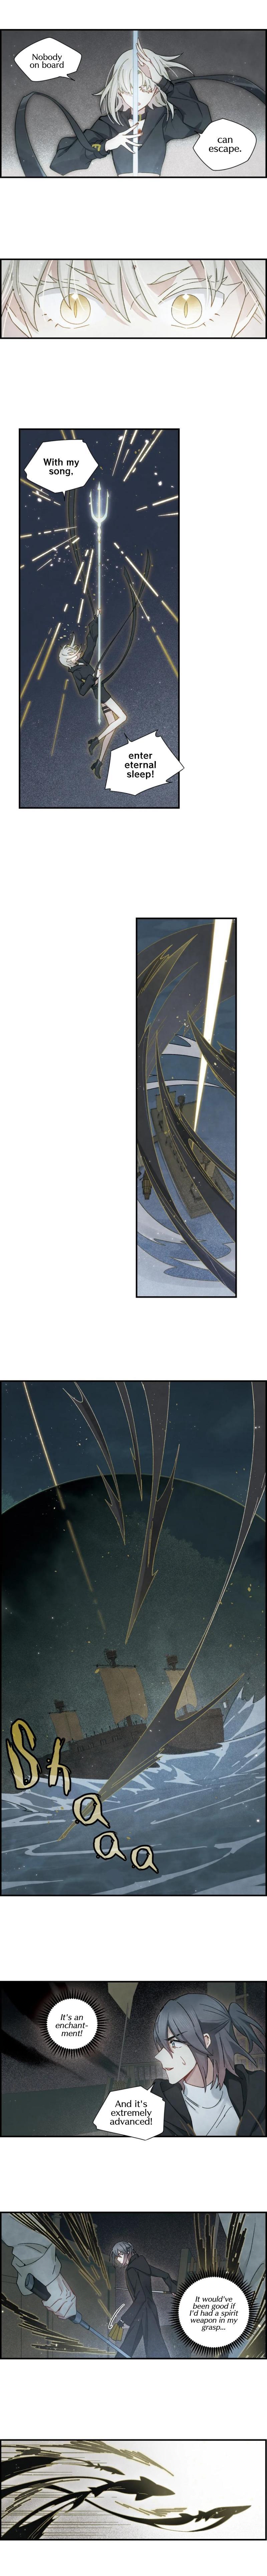 Mejaz - Regulus In The World Chapter 34.1: Demonic Influence page 4 - Mangakakalots.com